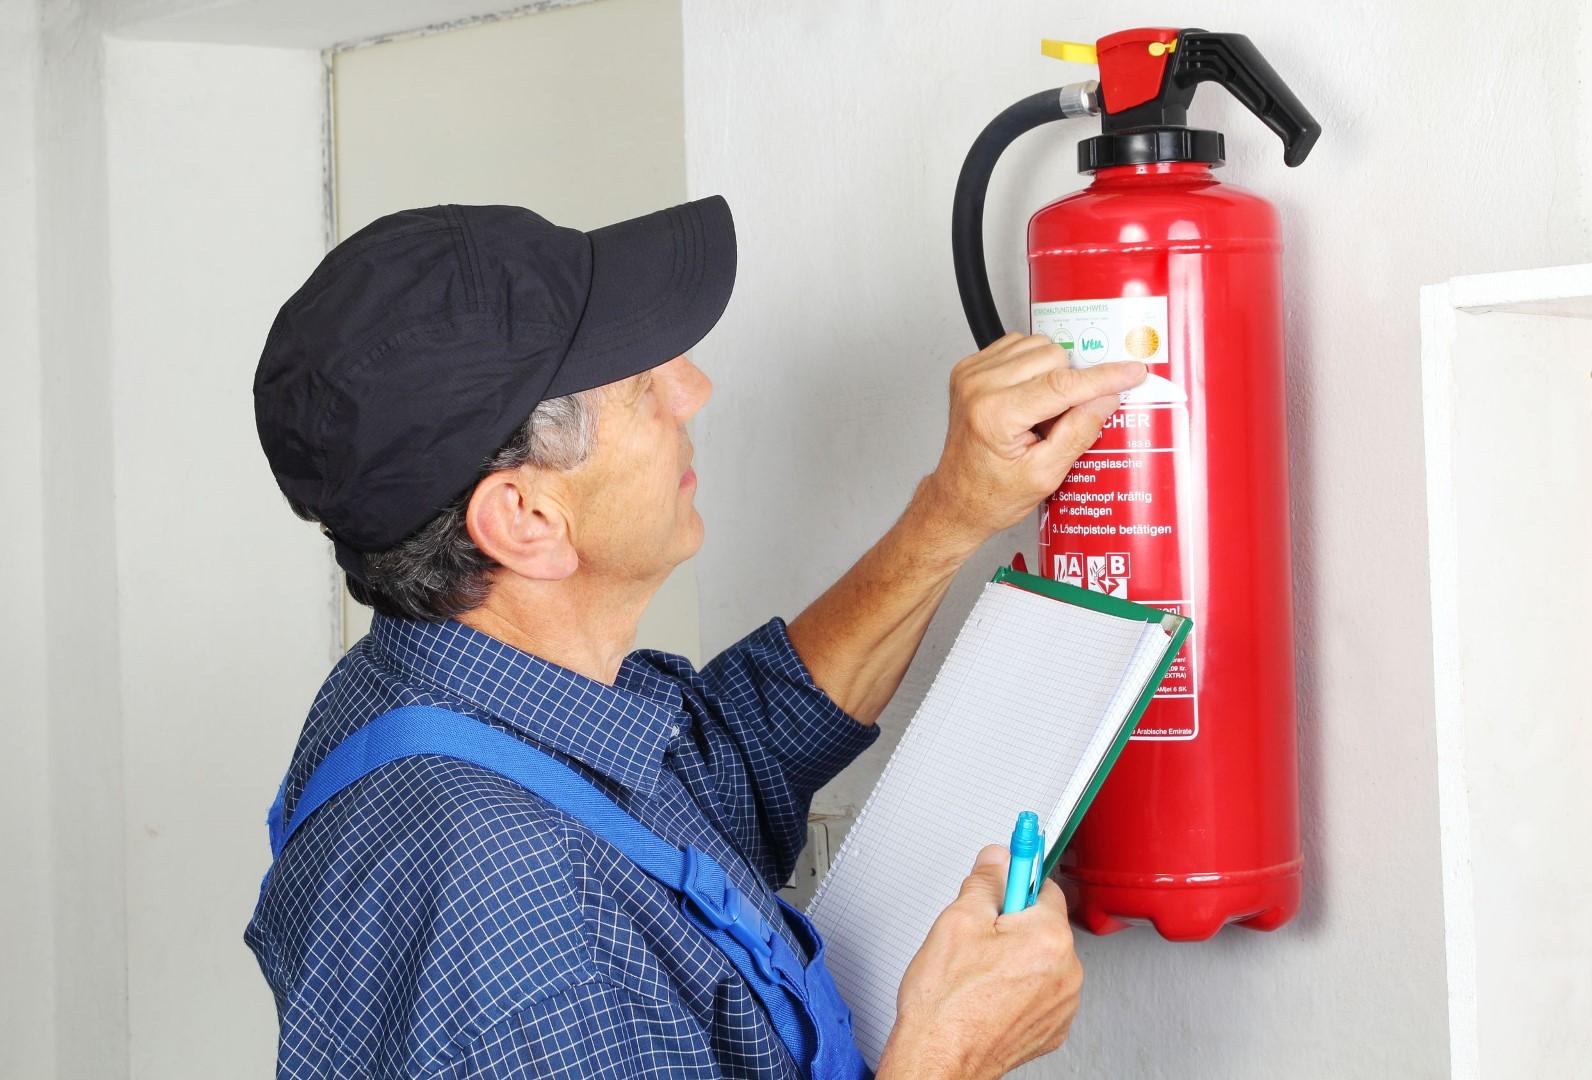 Care of extinguishers?